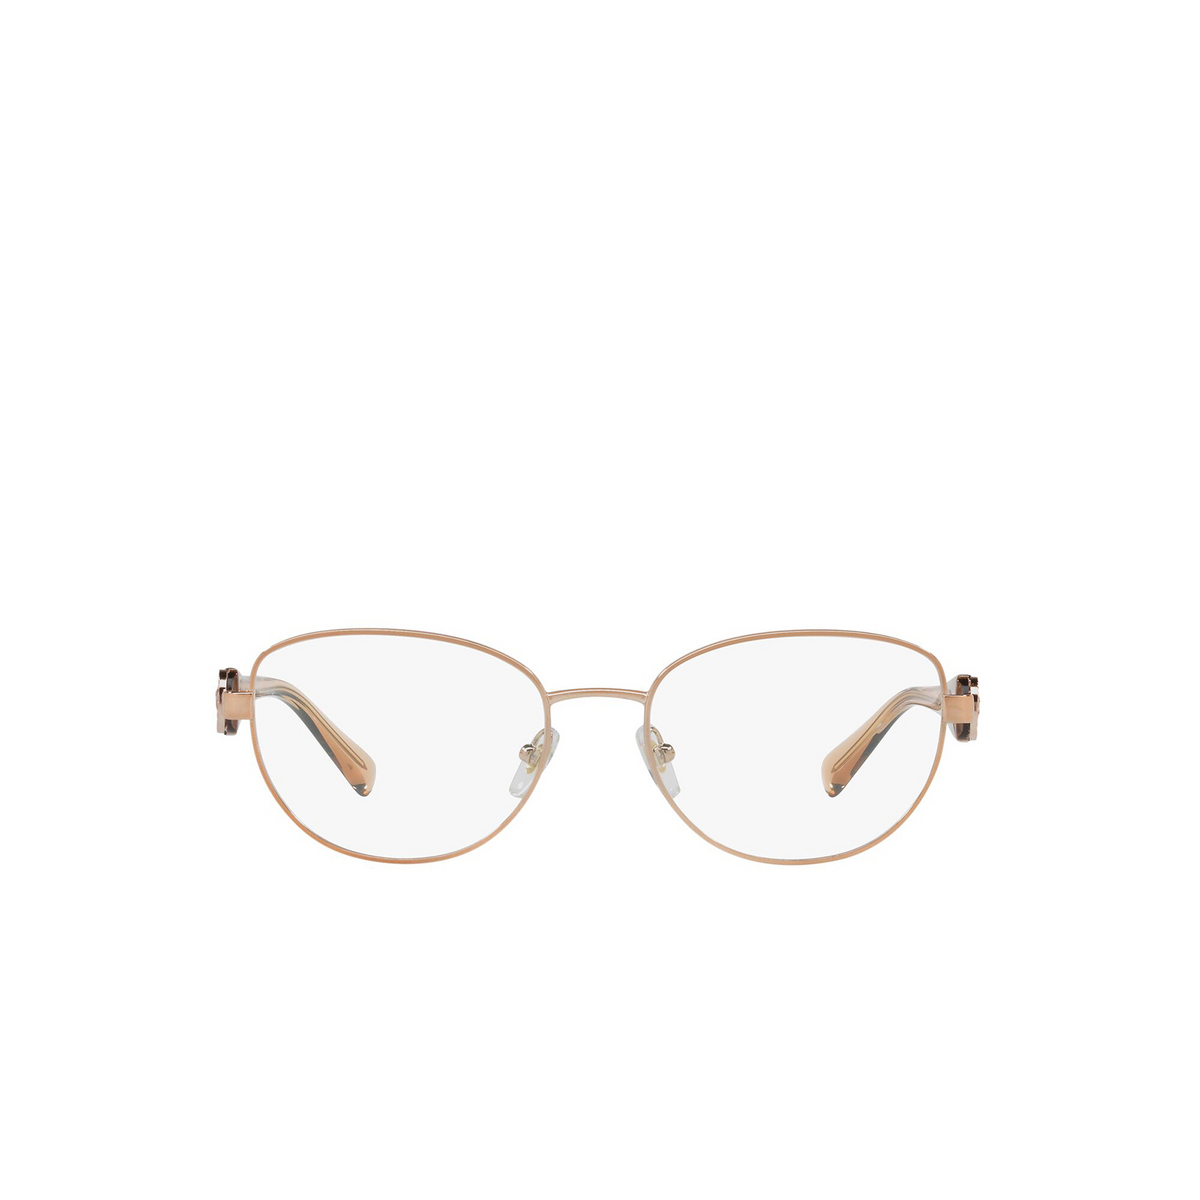 Versace® Oval Eyeglasses: VE1246B color Copper 1052 - front view.